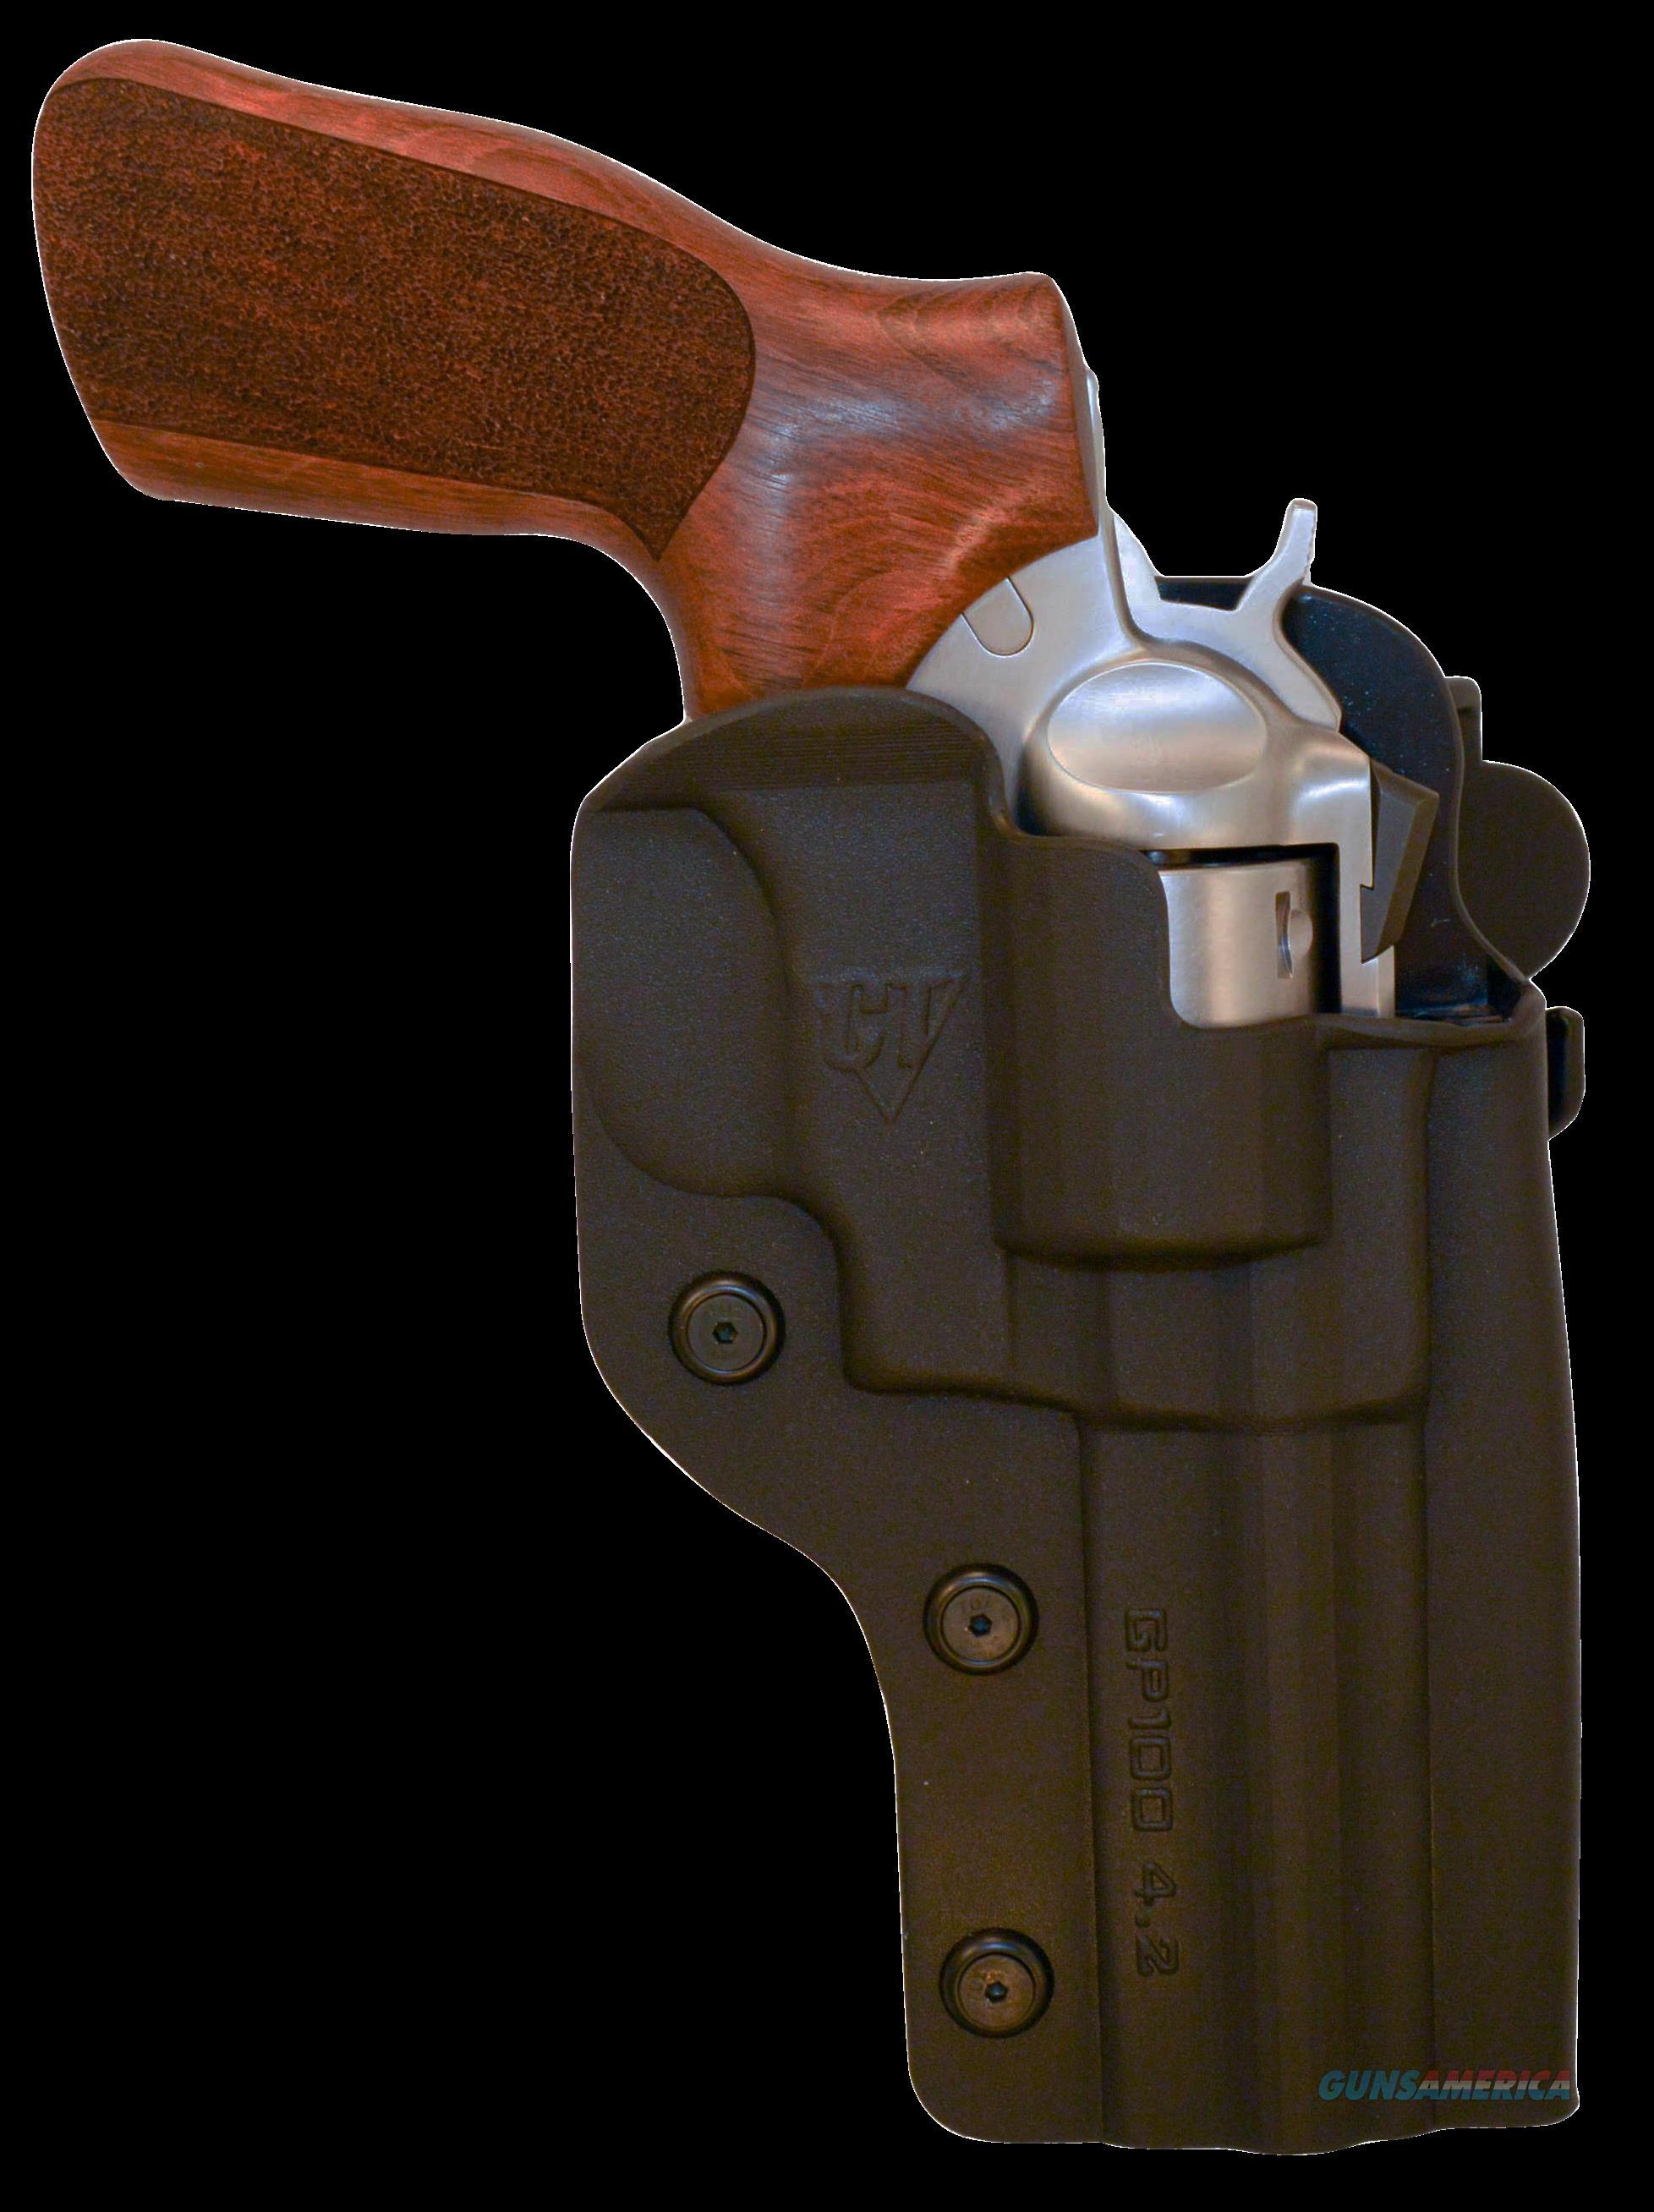 Comp-tac International, Comptac International Owb Hlstr Rug Gp 100 4.2  Guns > Pistols > 1911 Pistol Copies (non-Colt)